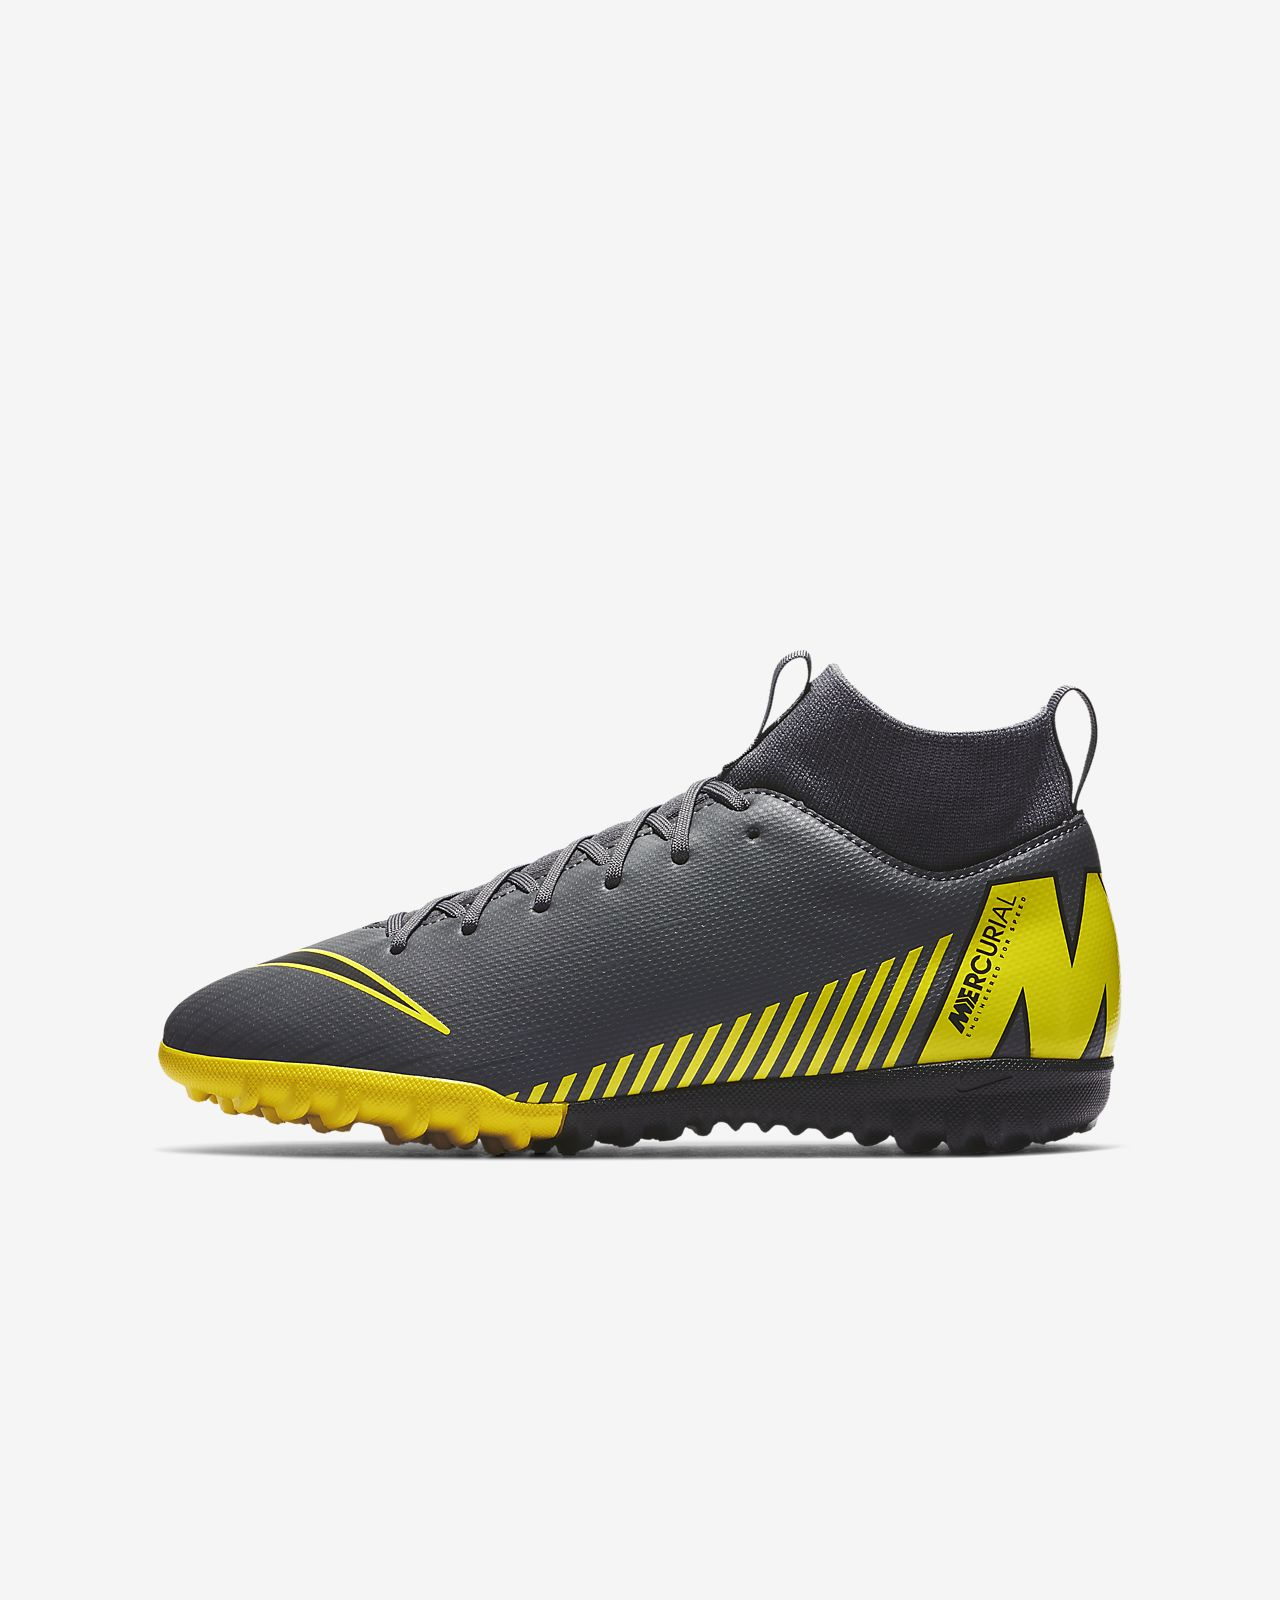 Nike Jr. SuperflyX 6 Academy TF Küçük/Genç Çocuk Halı Saha Kramponu